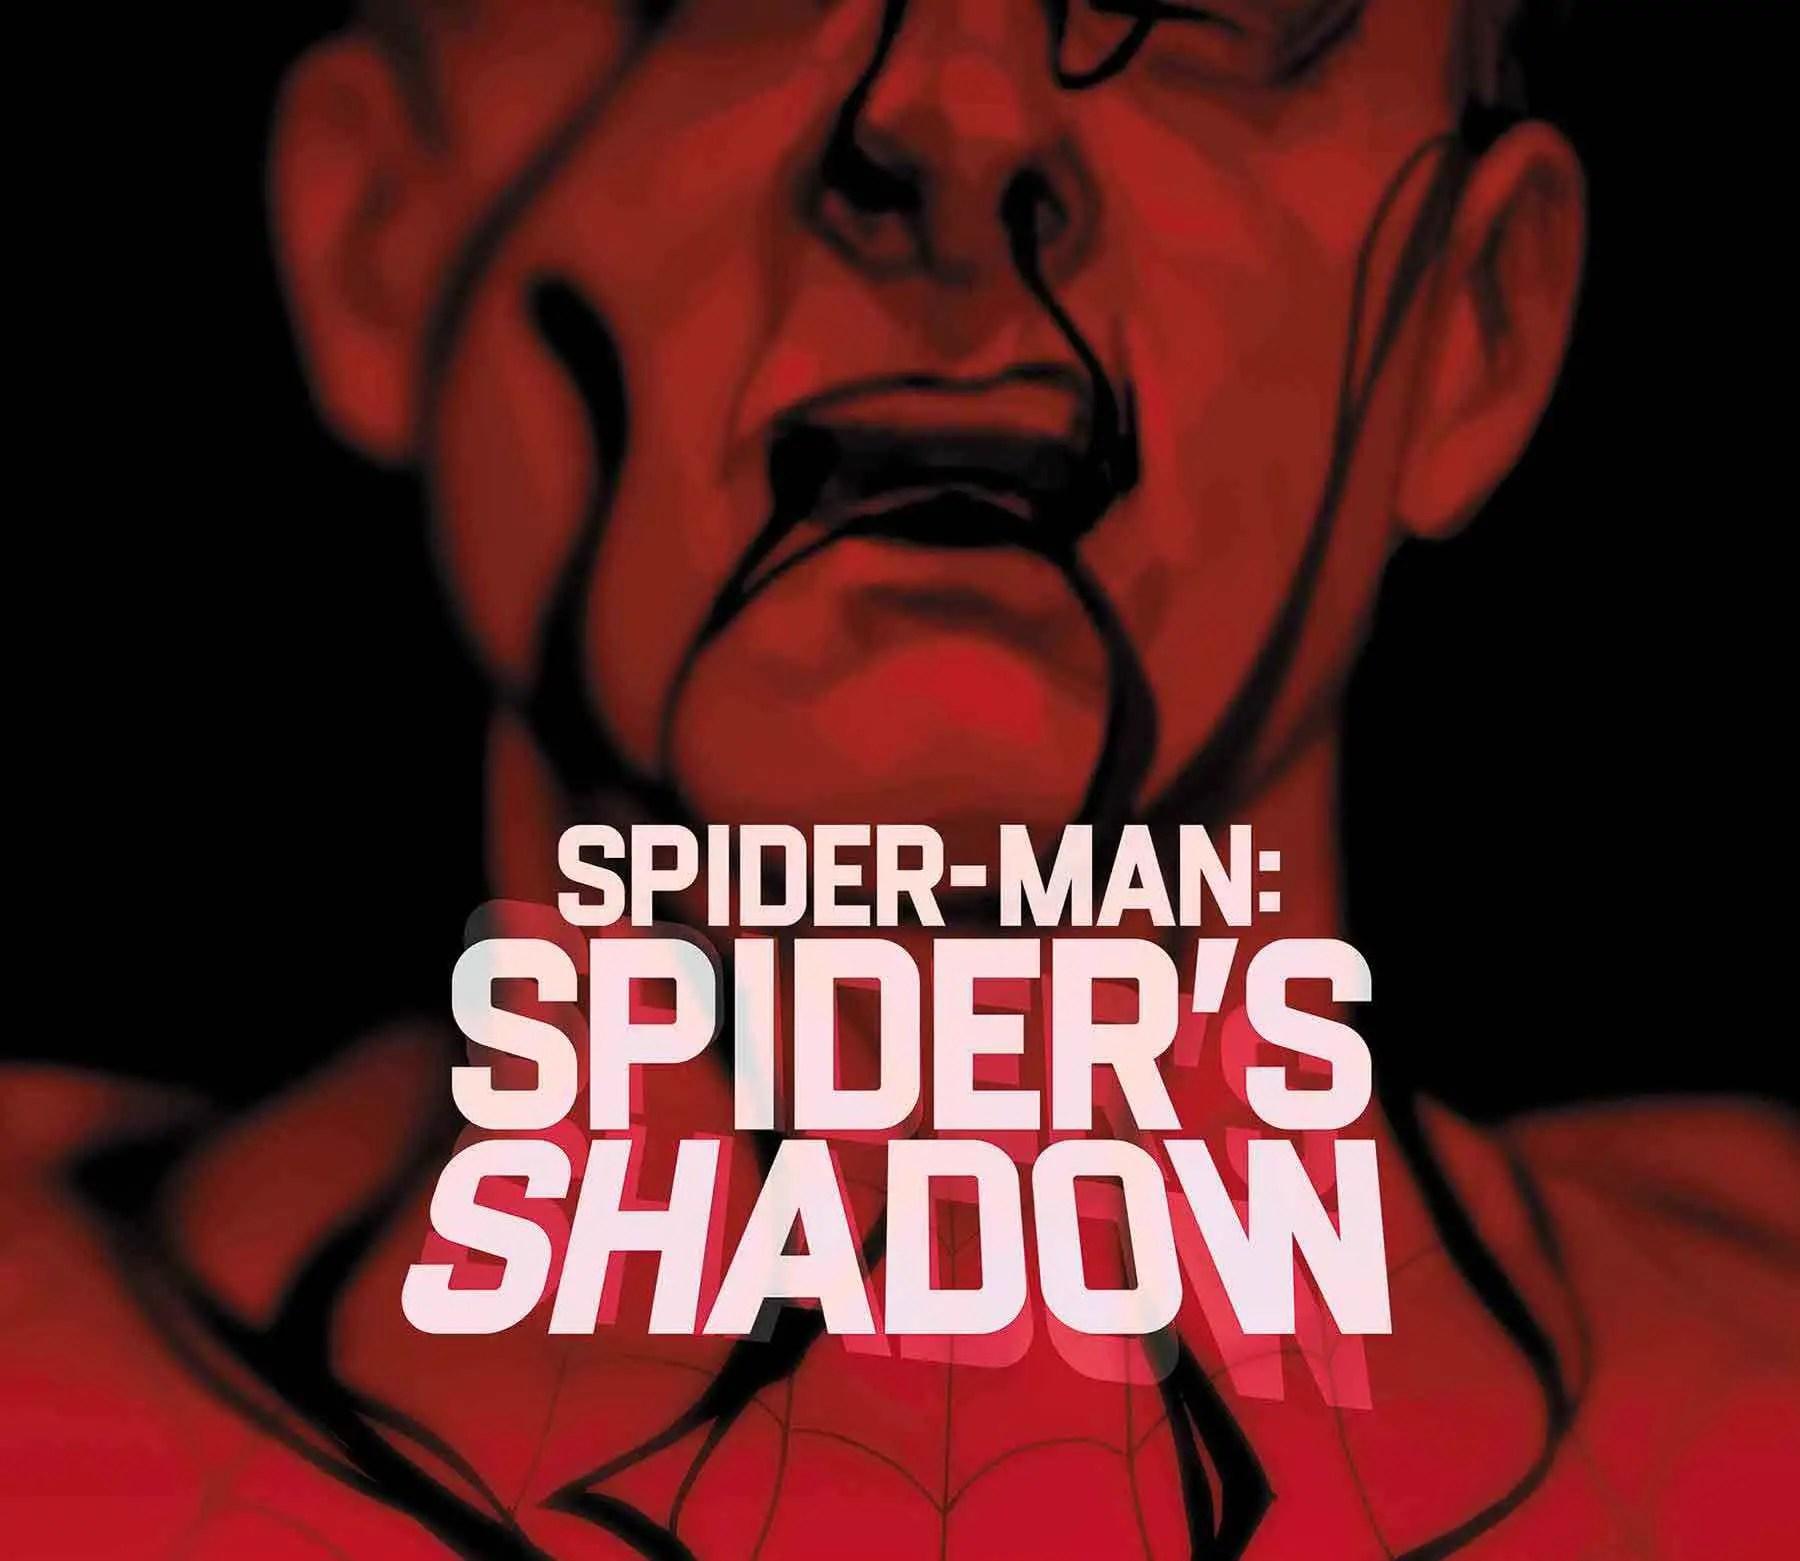 'Spider-Man: Spider's Shadow' #1 review: a dark web we weave